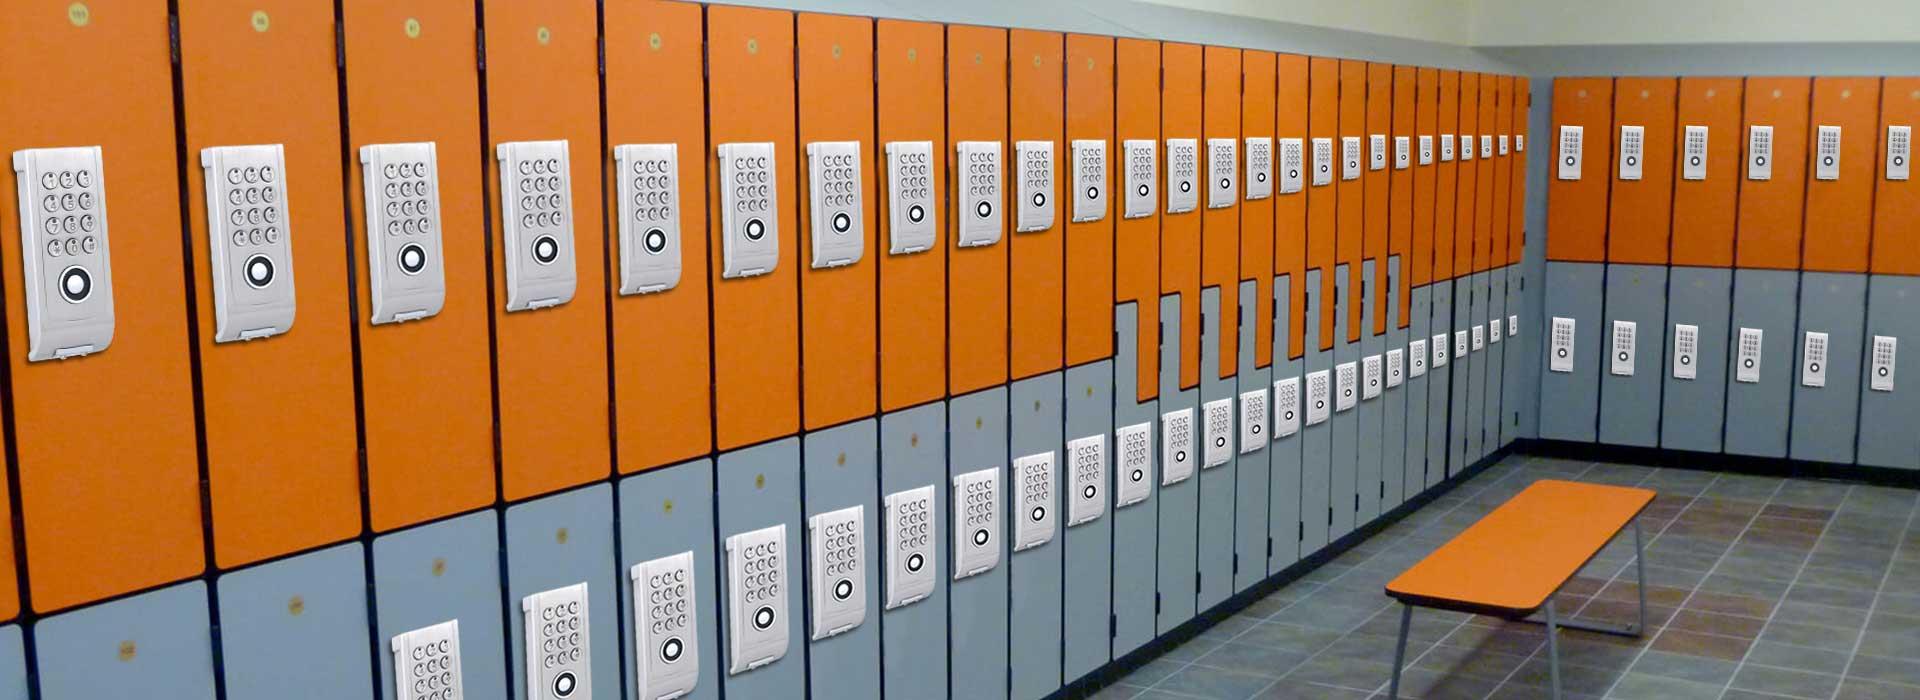 digital locker lock manufacturer